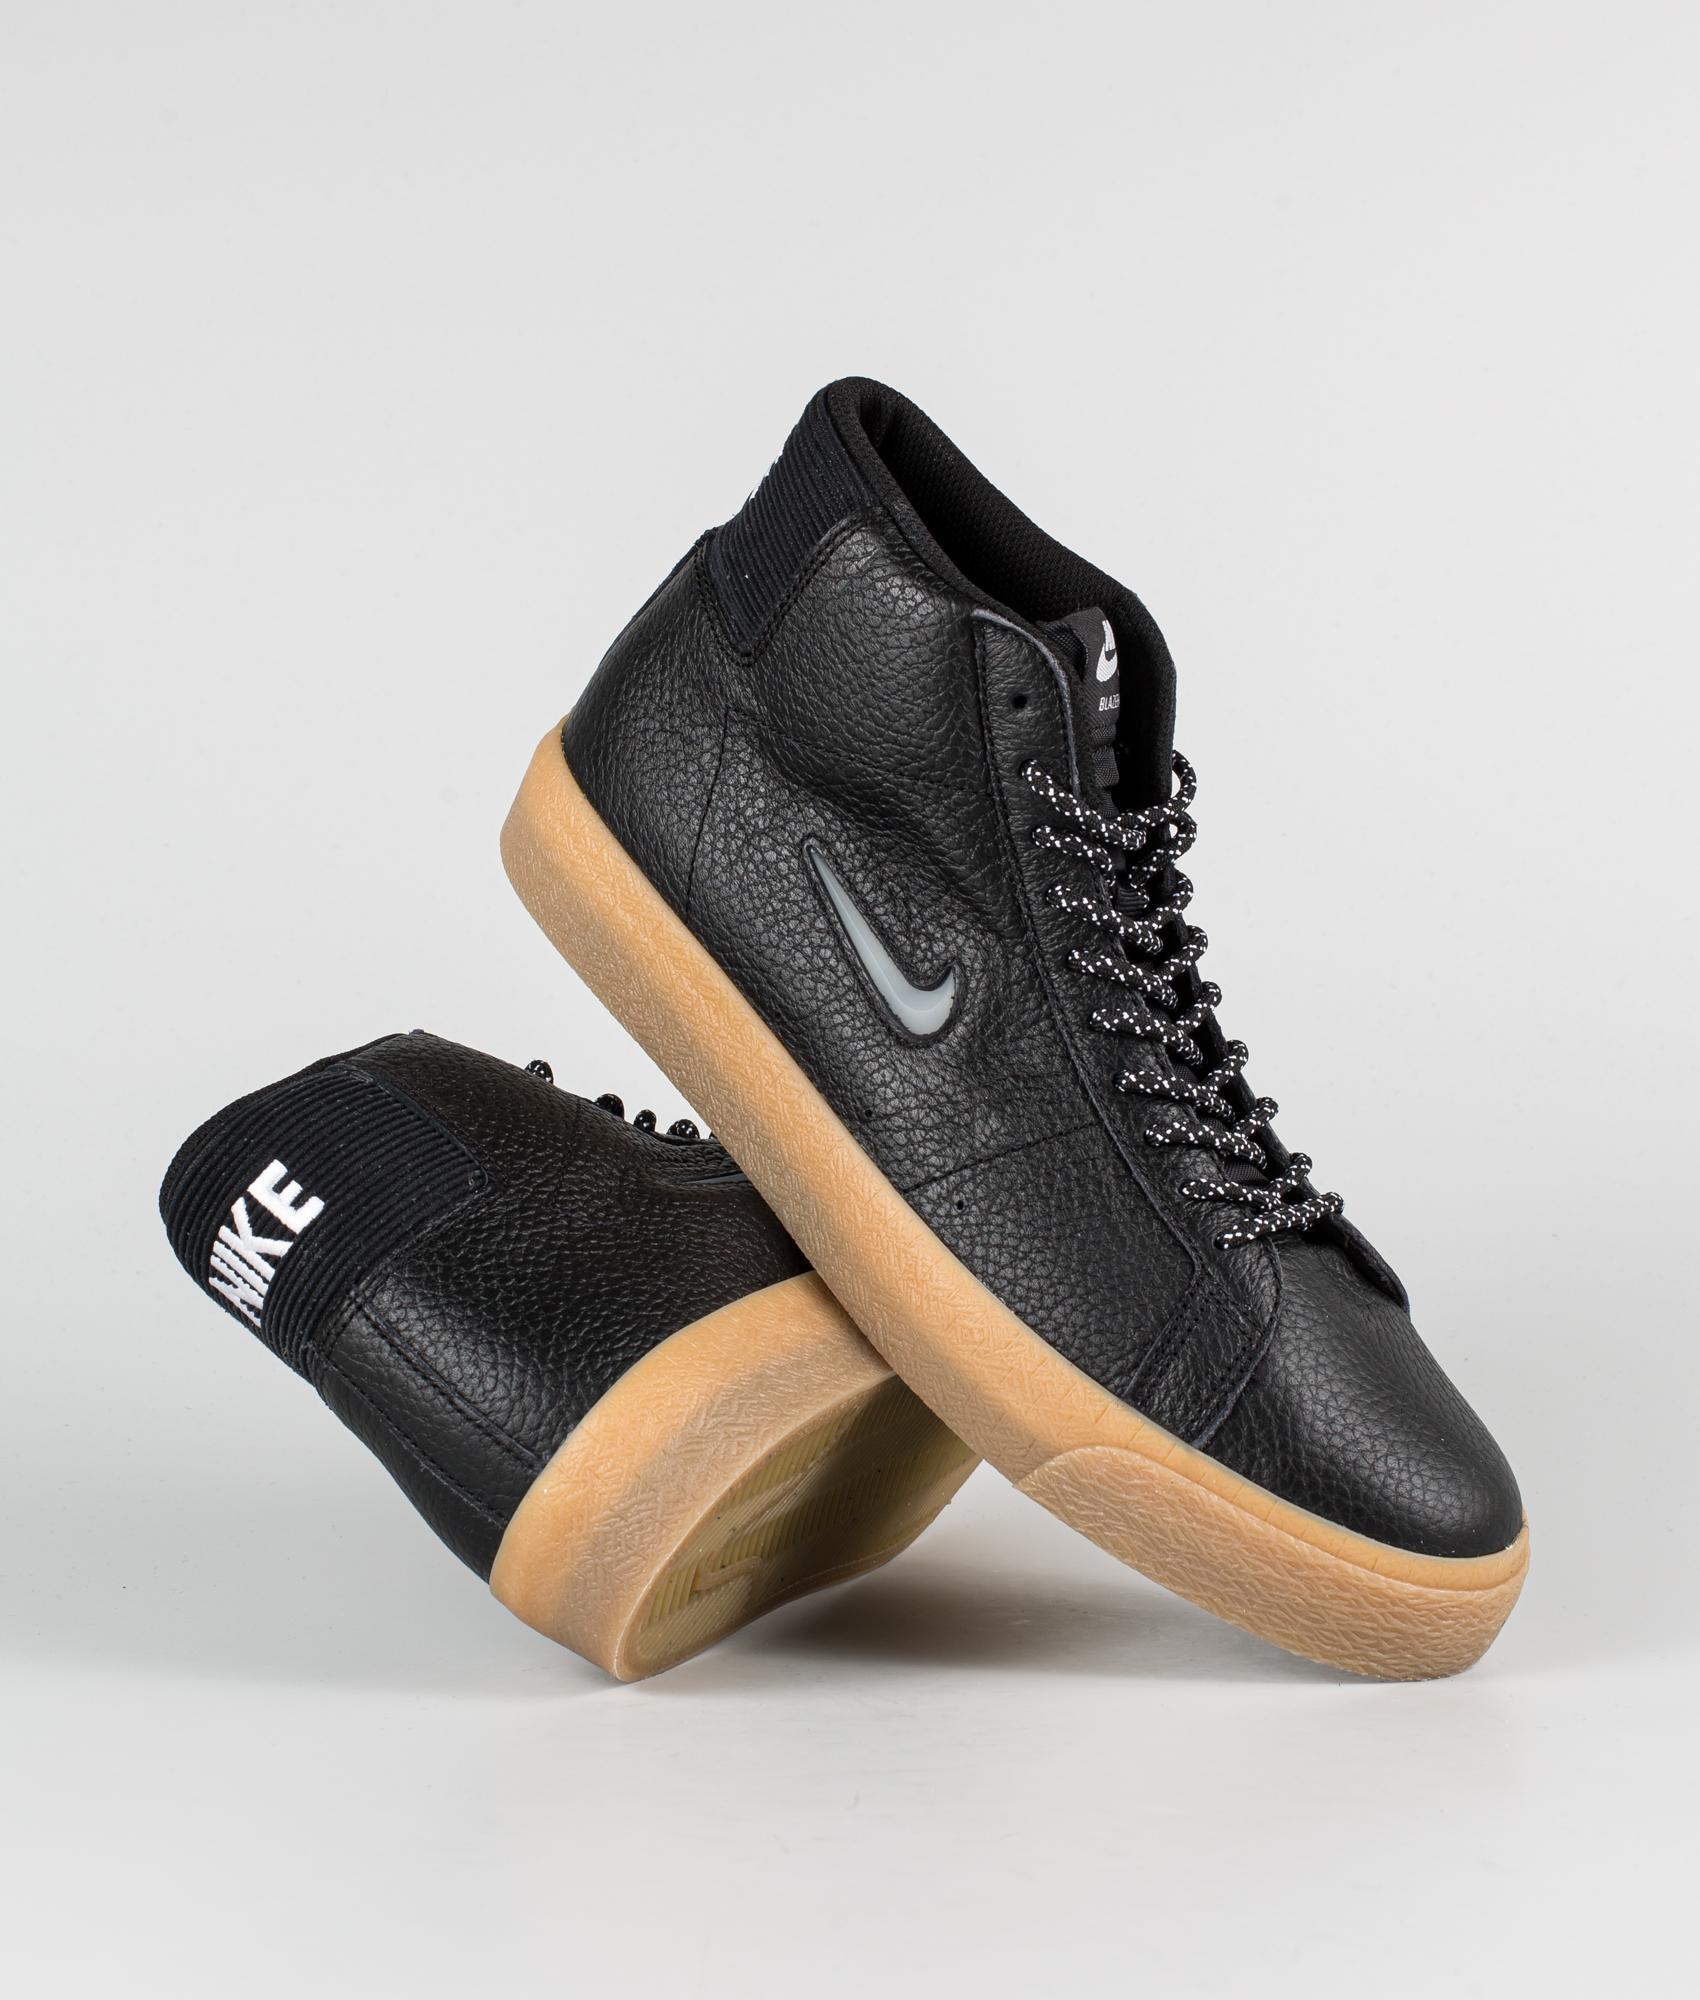 Nike Zoom Blazer Mid Premium Shoes Black/White-Black-Gum Light Brown